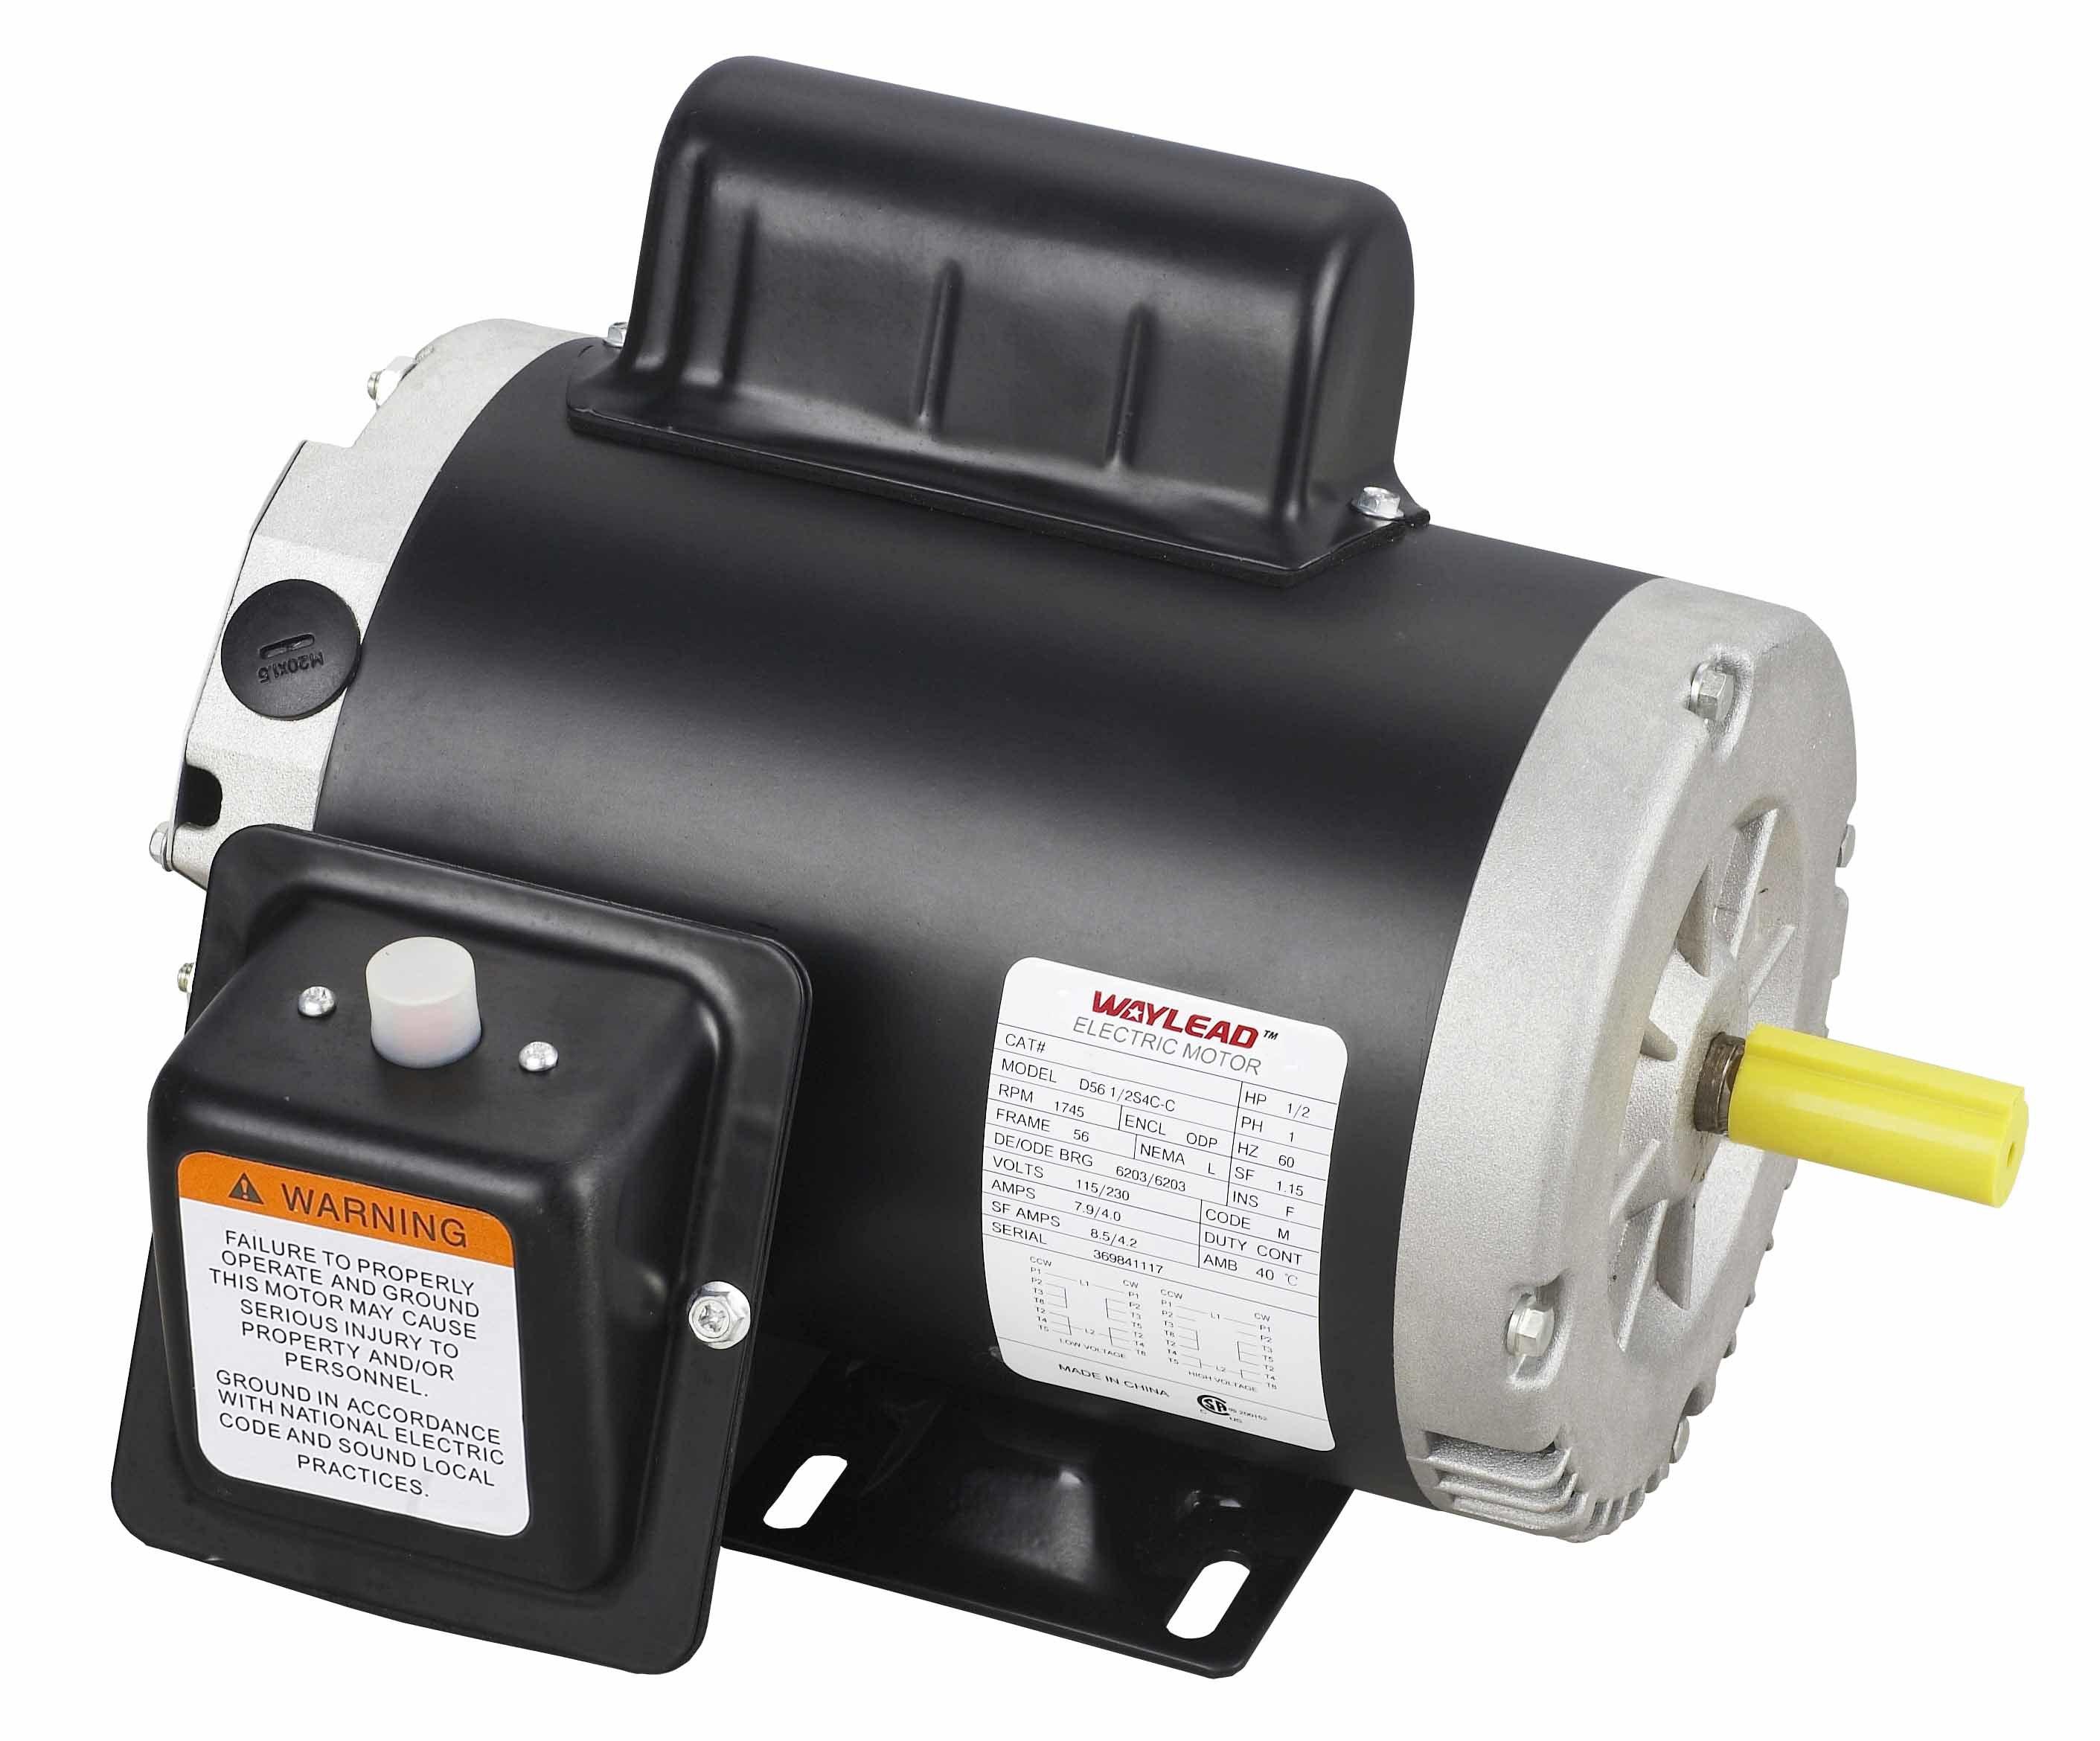 China capacitor running single phase ac motor photos for 1 phase ac motor